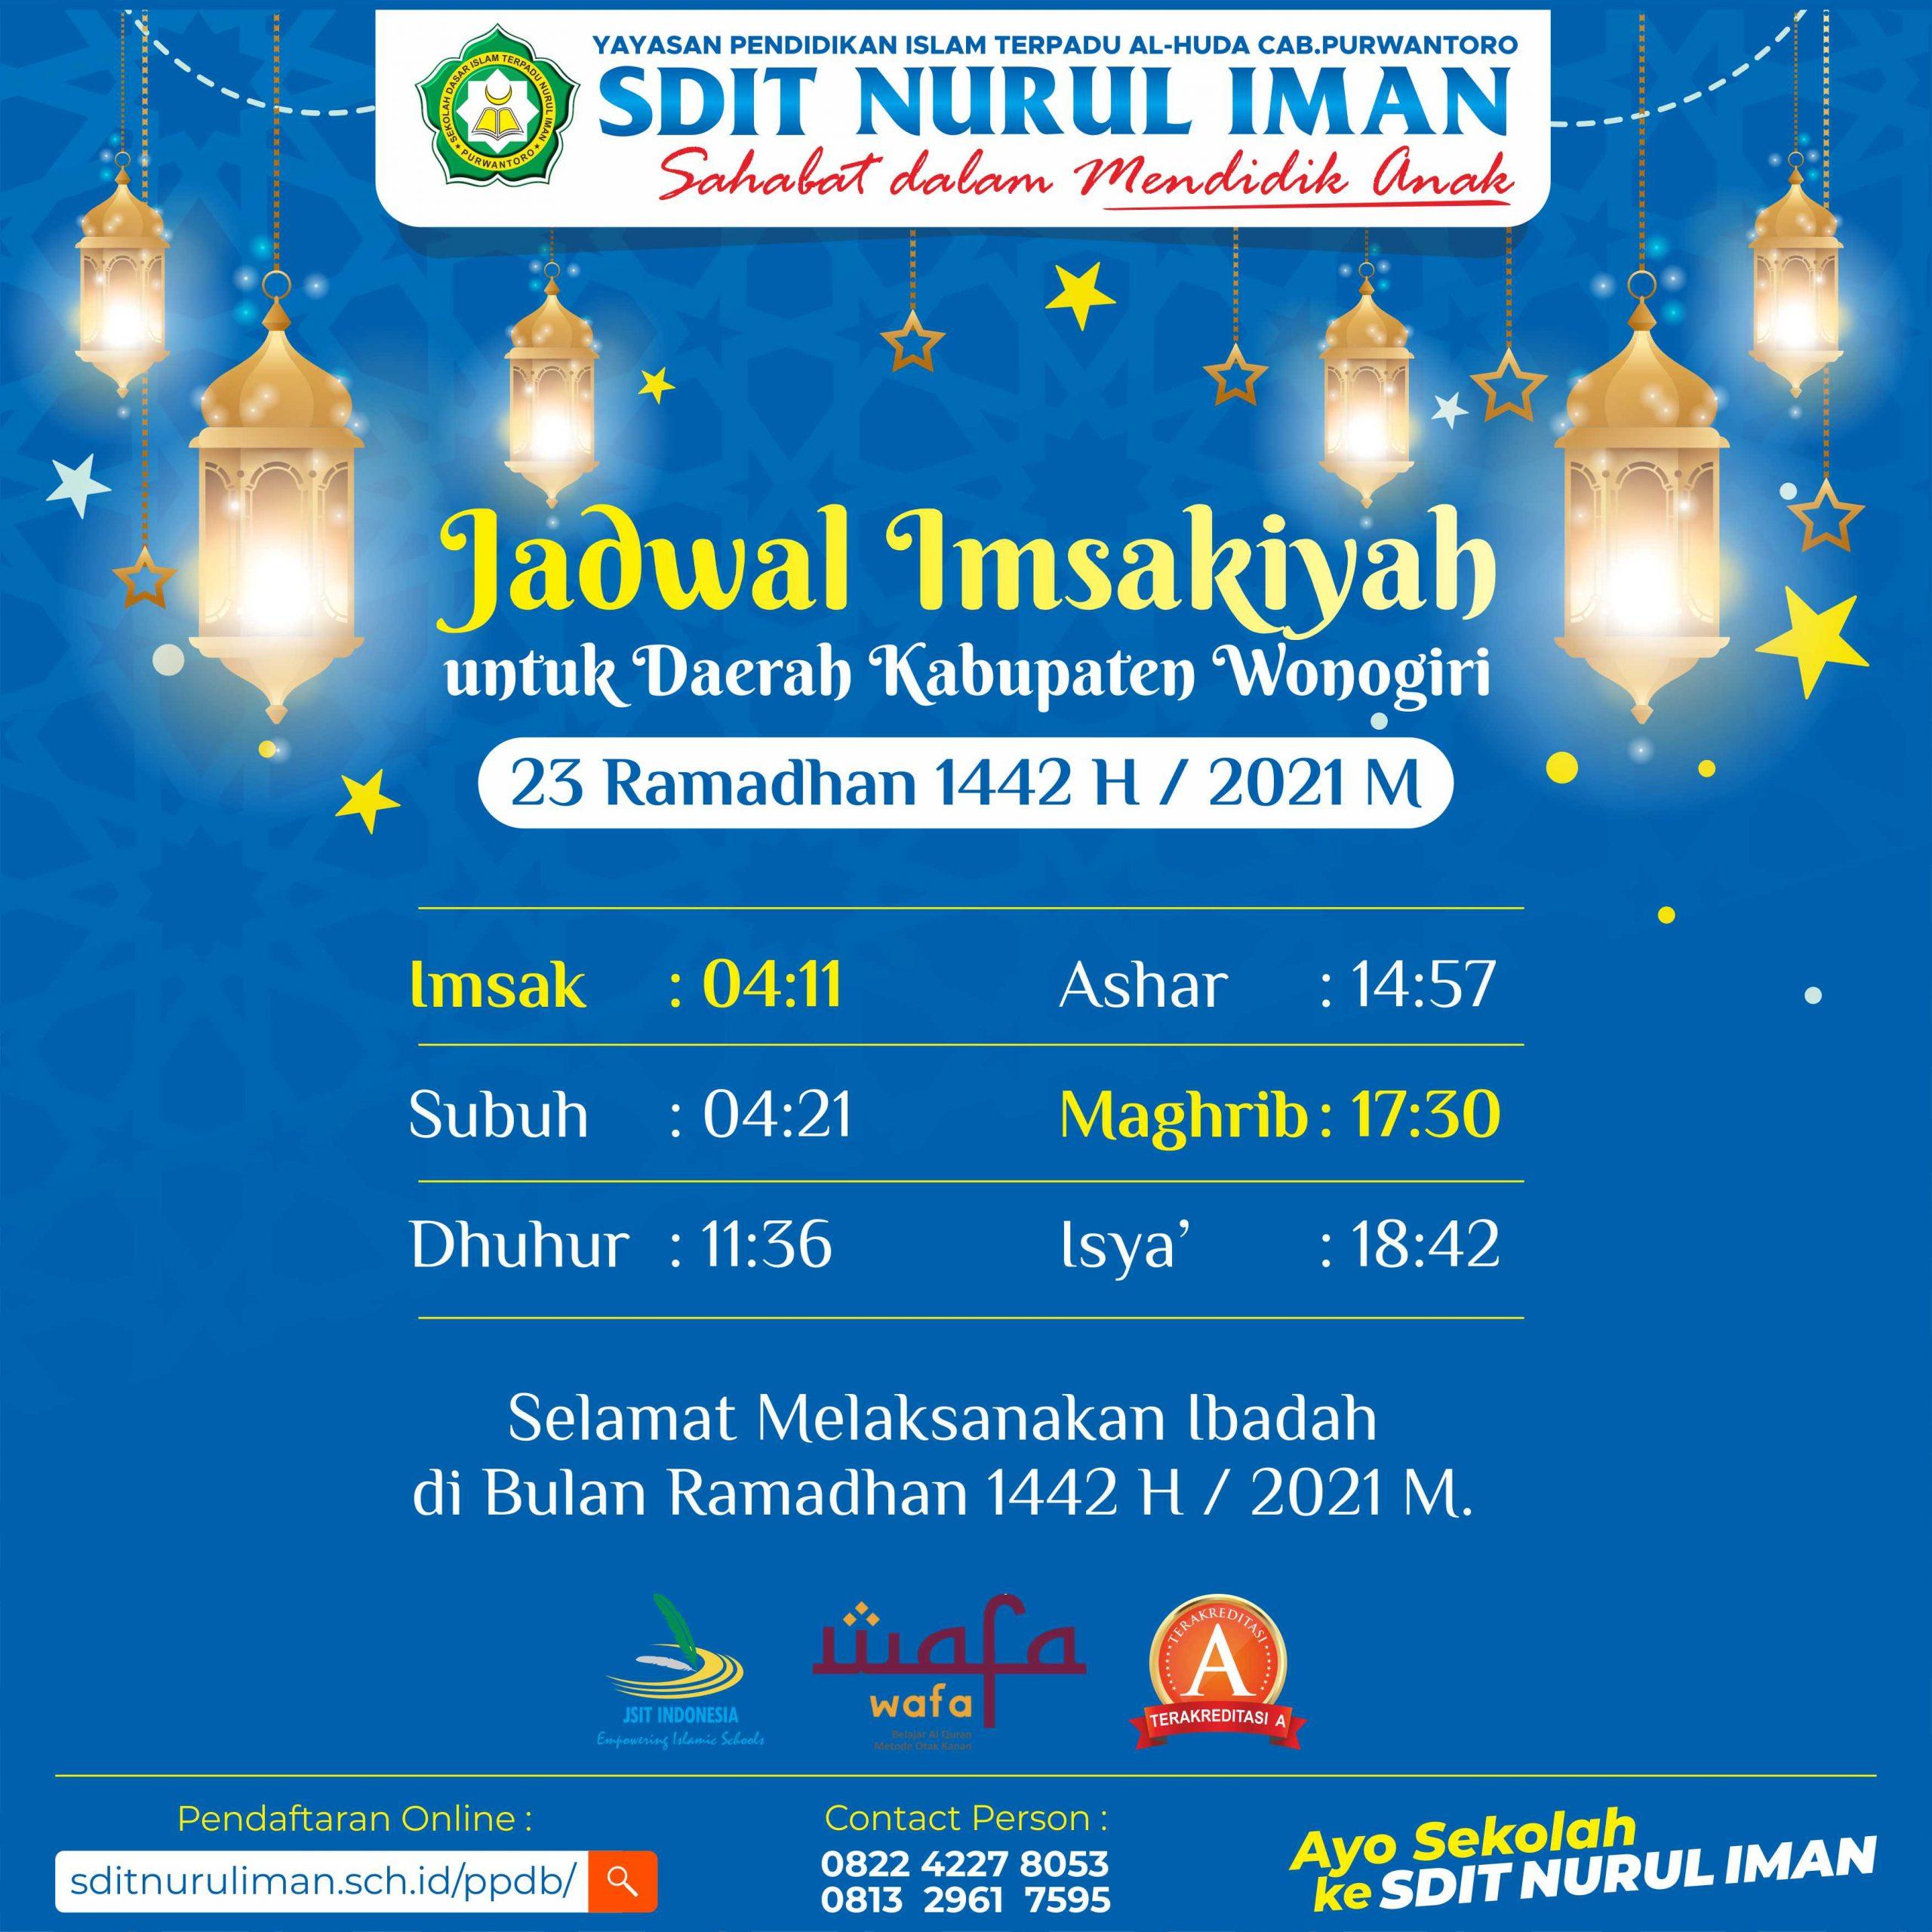 23 Ramadhan 1442 H